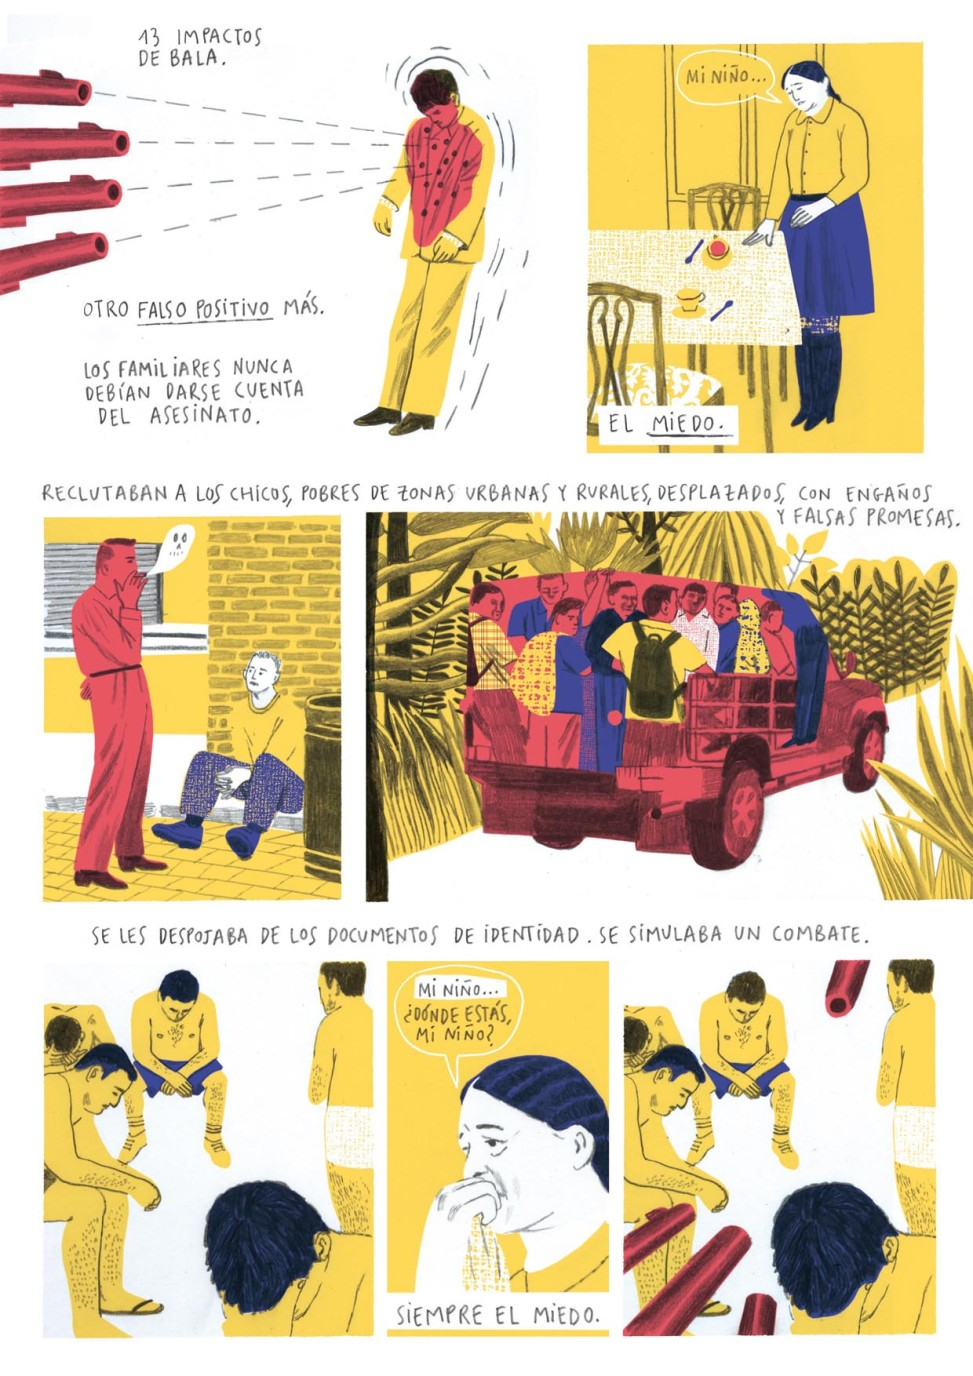 02-Sonia-Pulido-Oxfam-Intermon-La madeja-2